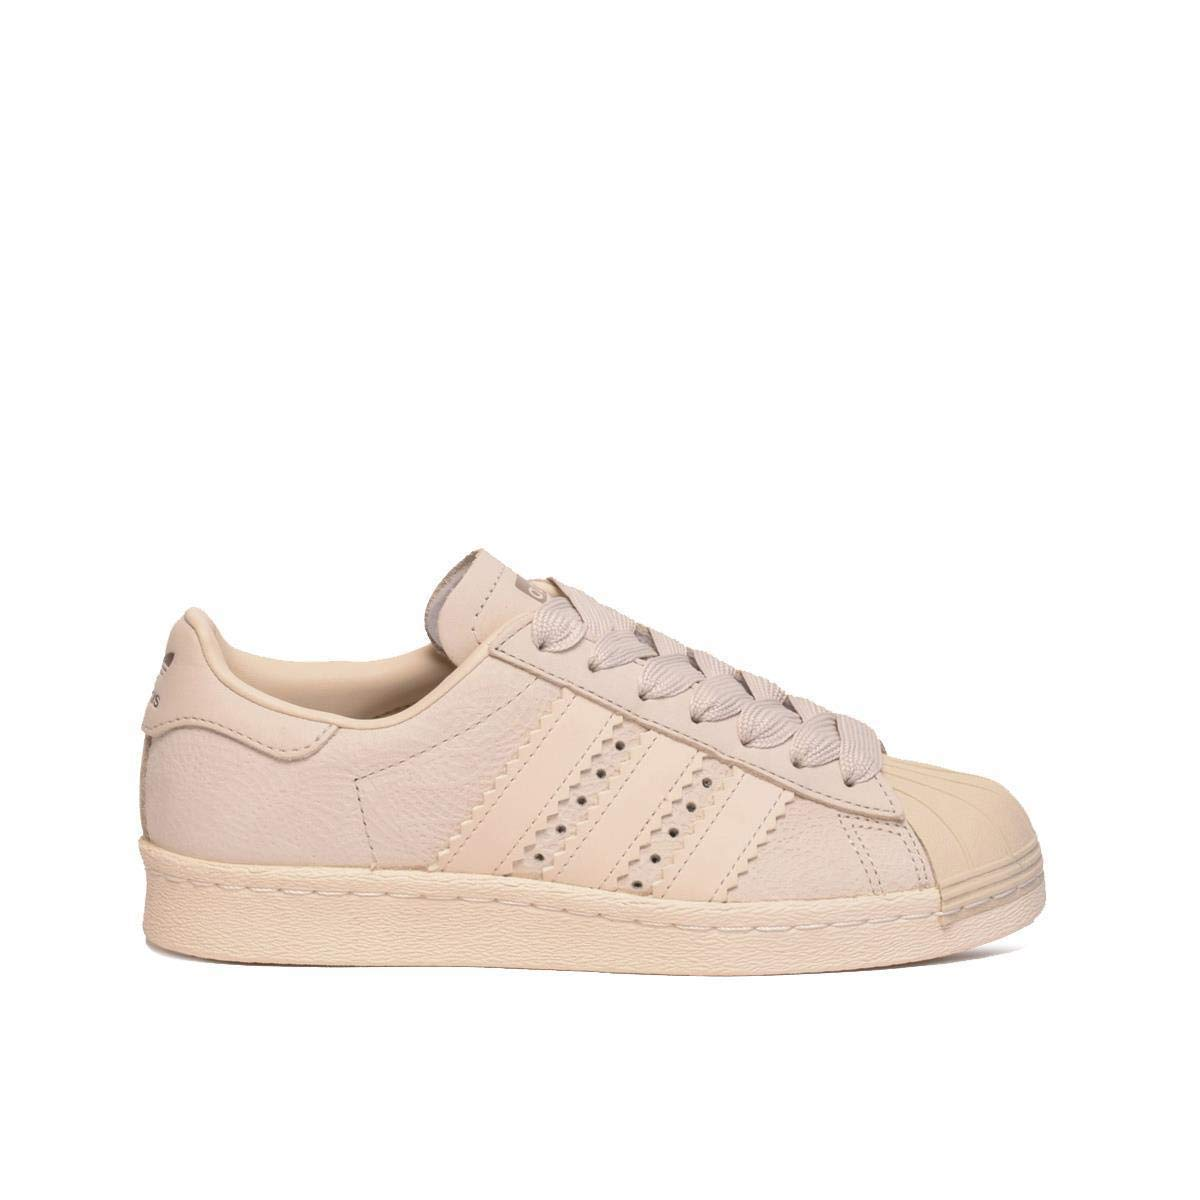 MultiCouleure (Marcla Marcla Casbla 000) 36 1 3 EU adidas Superstar 80s W, Chaussures de Fitness Femme